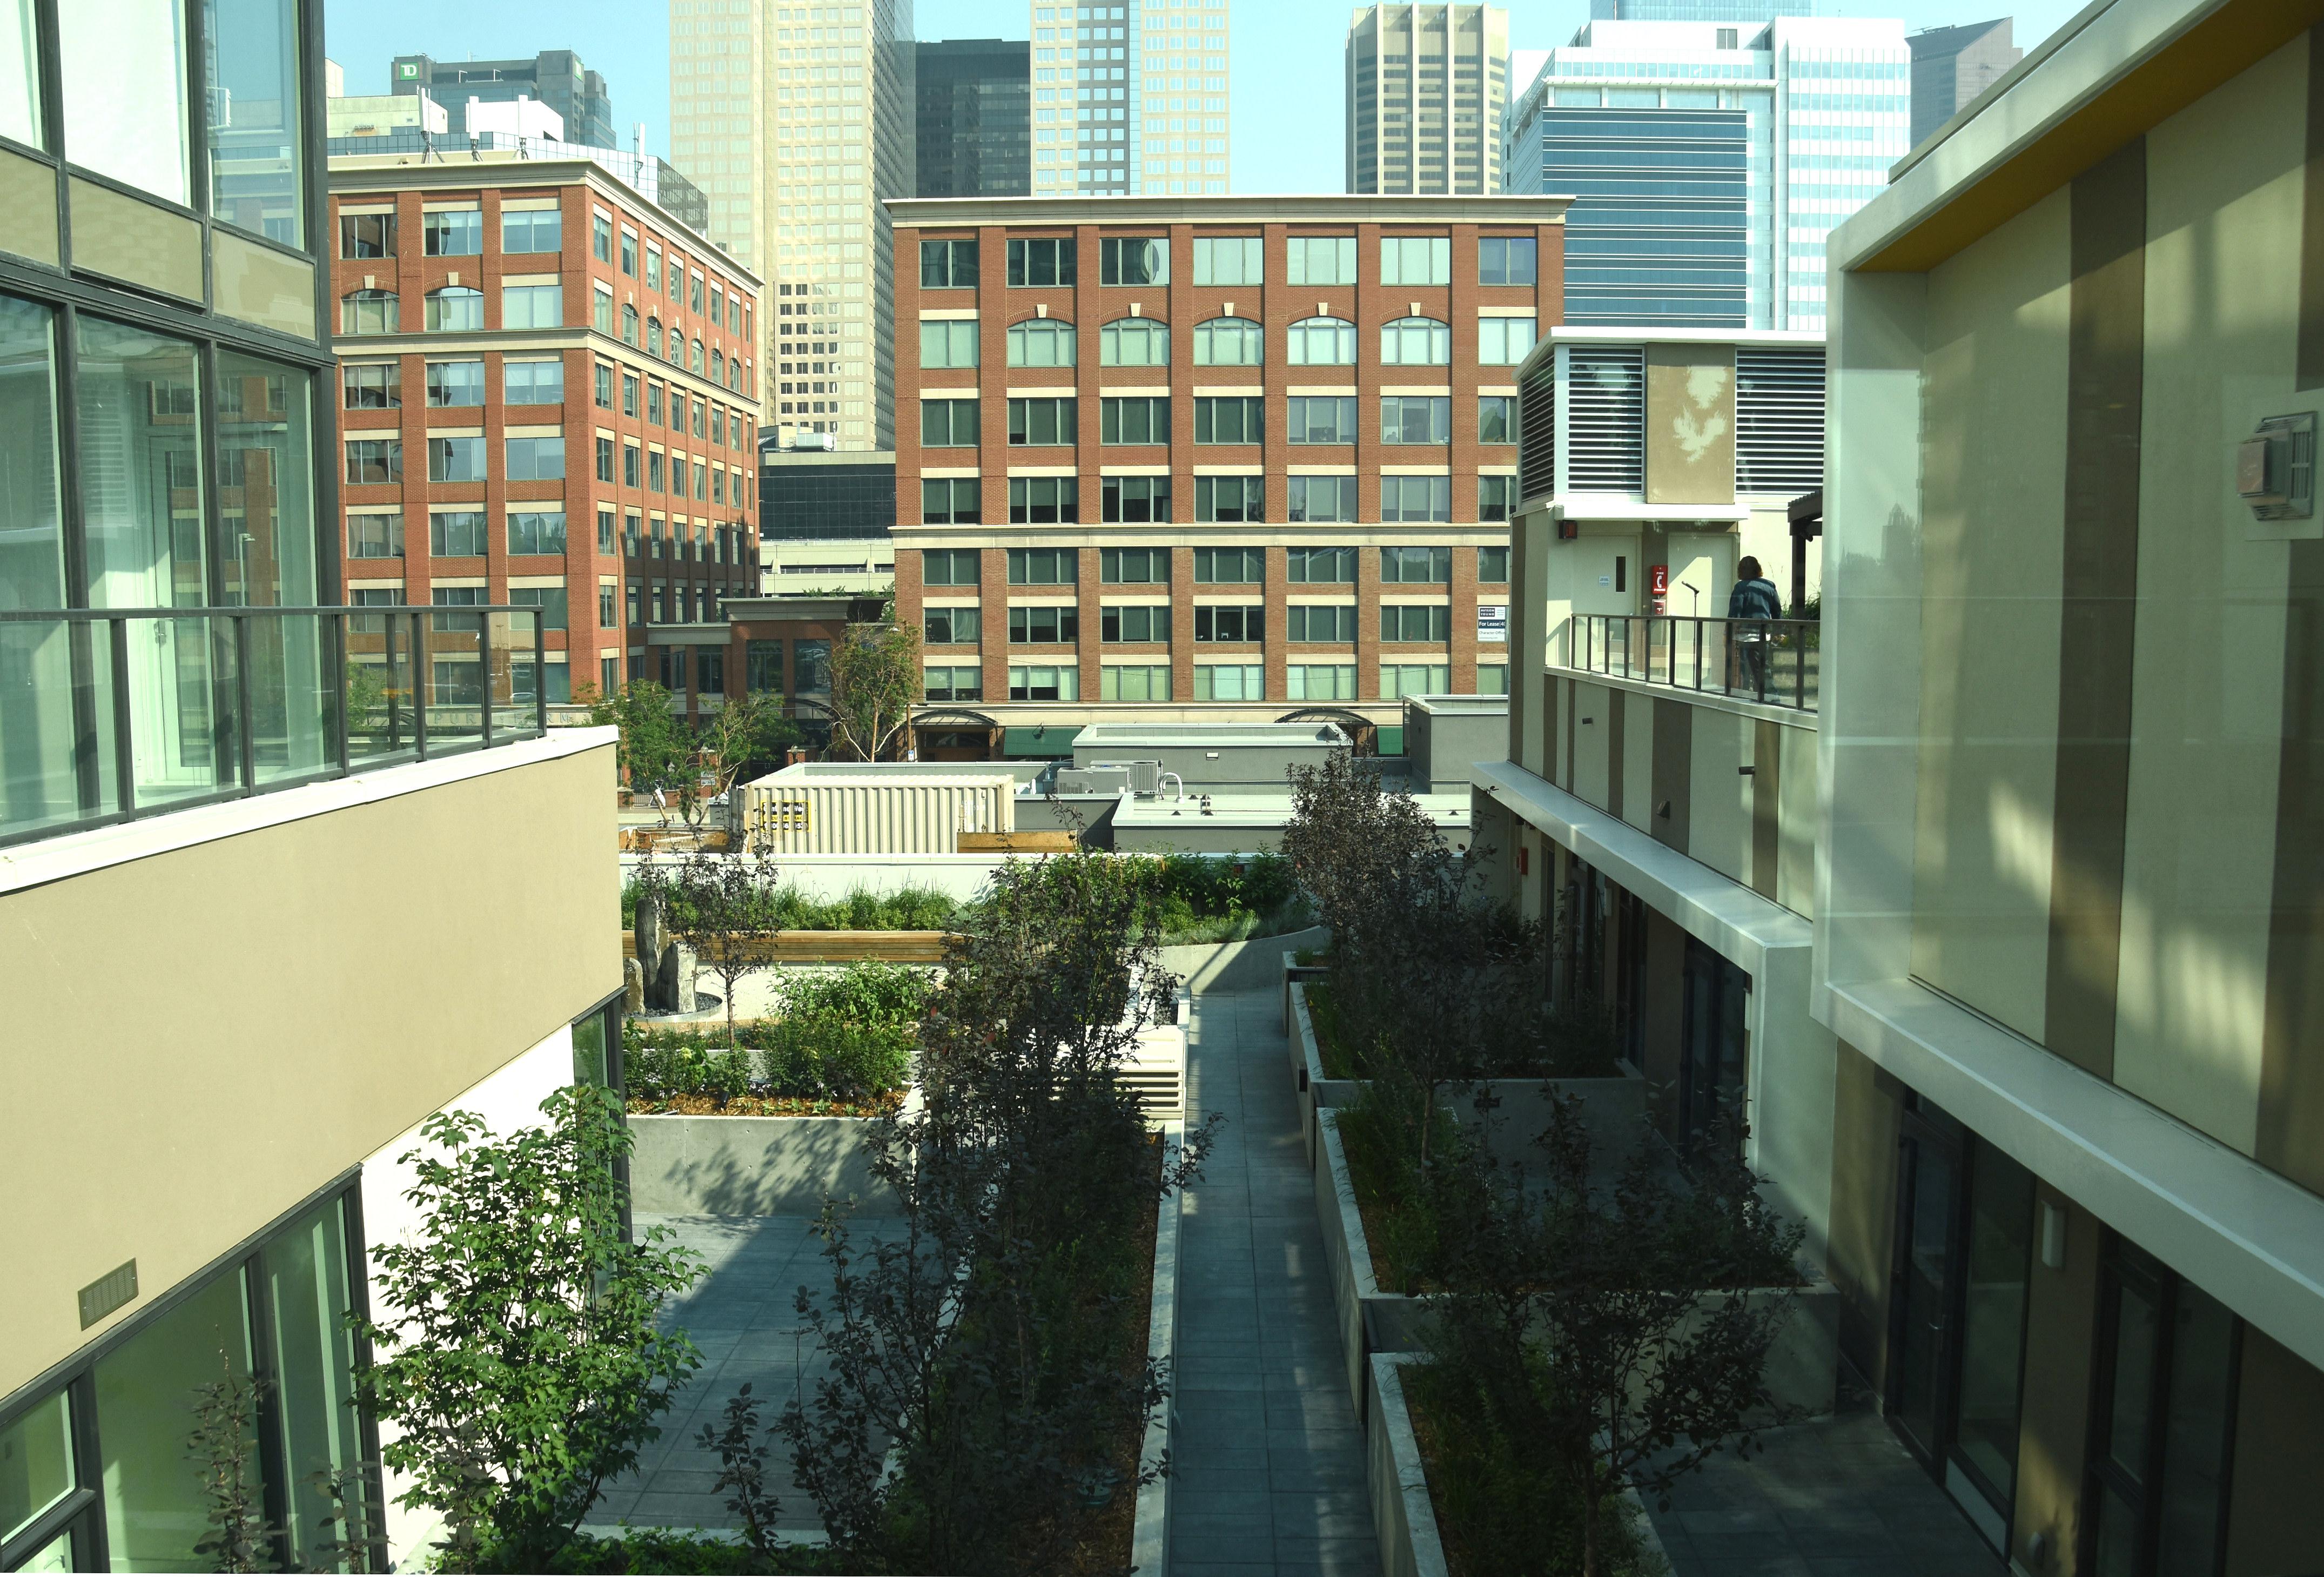 Zen Garden Terrace, image via Kevin Cappis